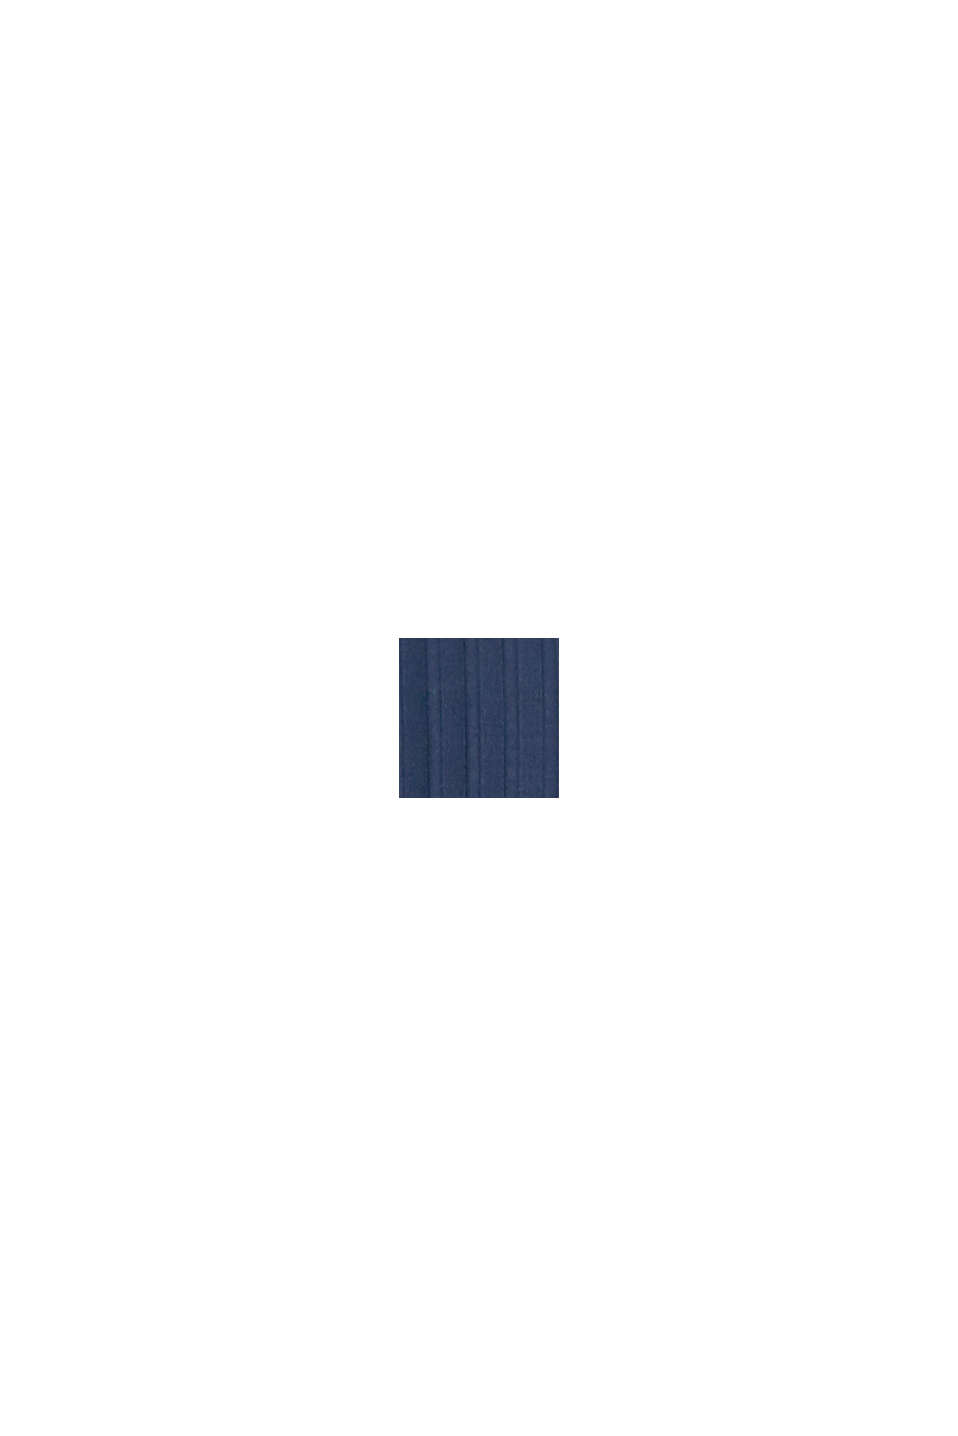 Bukser af jerseystretch med ribstruktur, NAVY, swatch